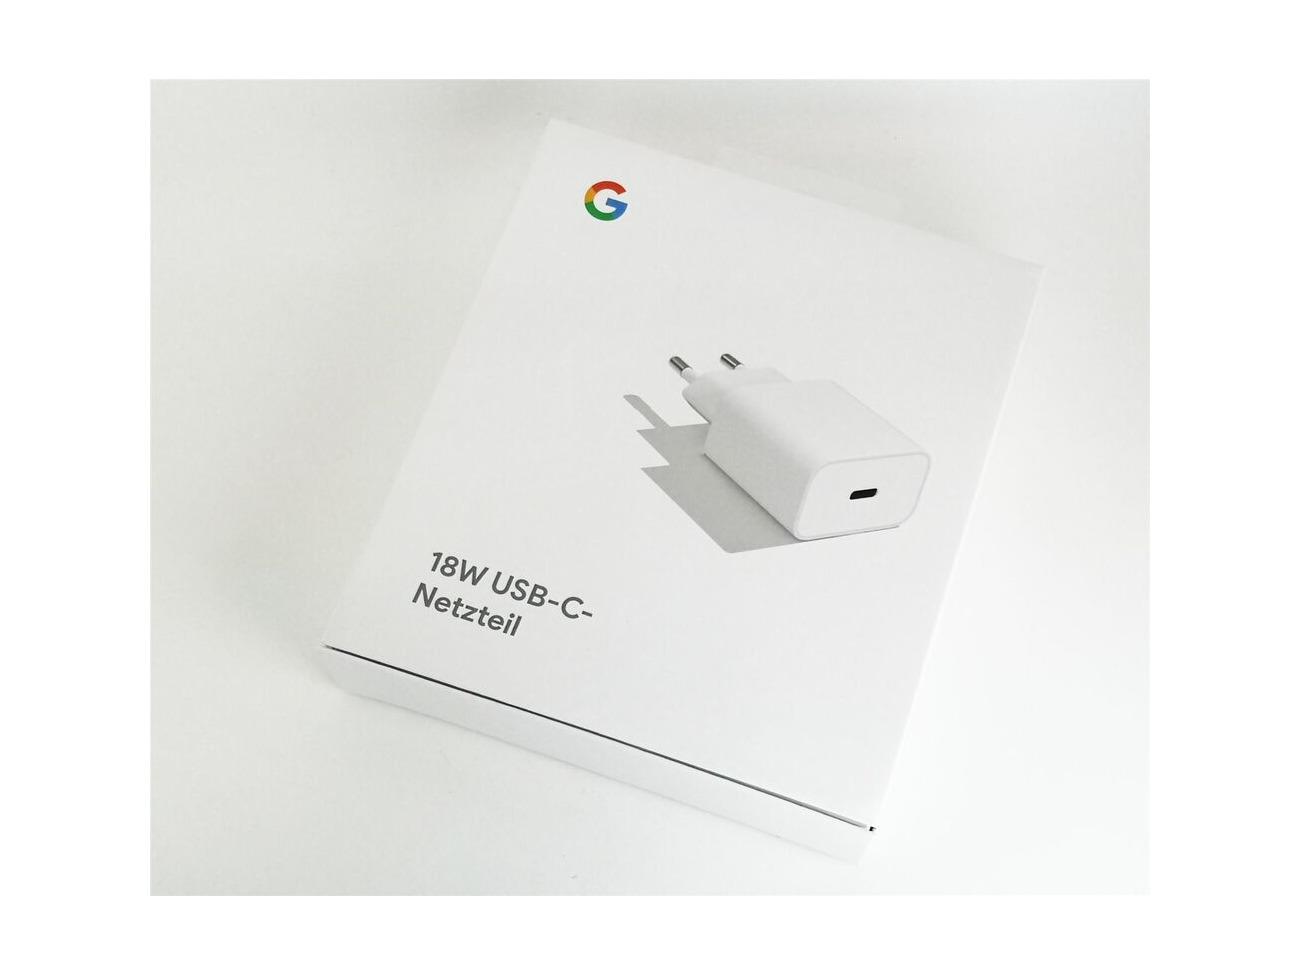 3x Genuine Google Pixel 3 USB C Charger